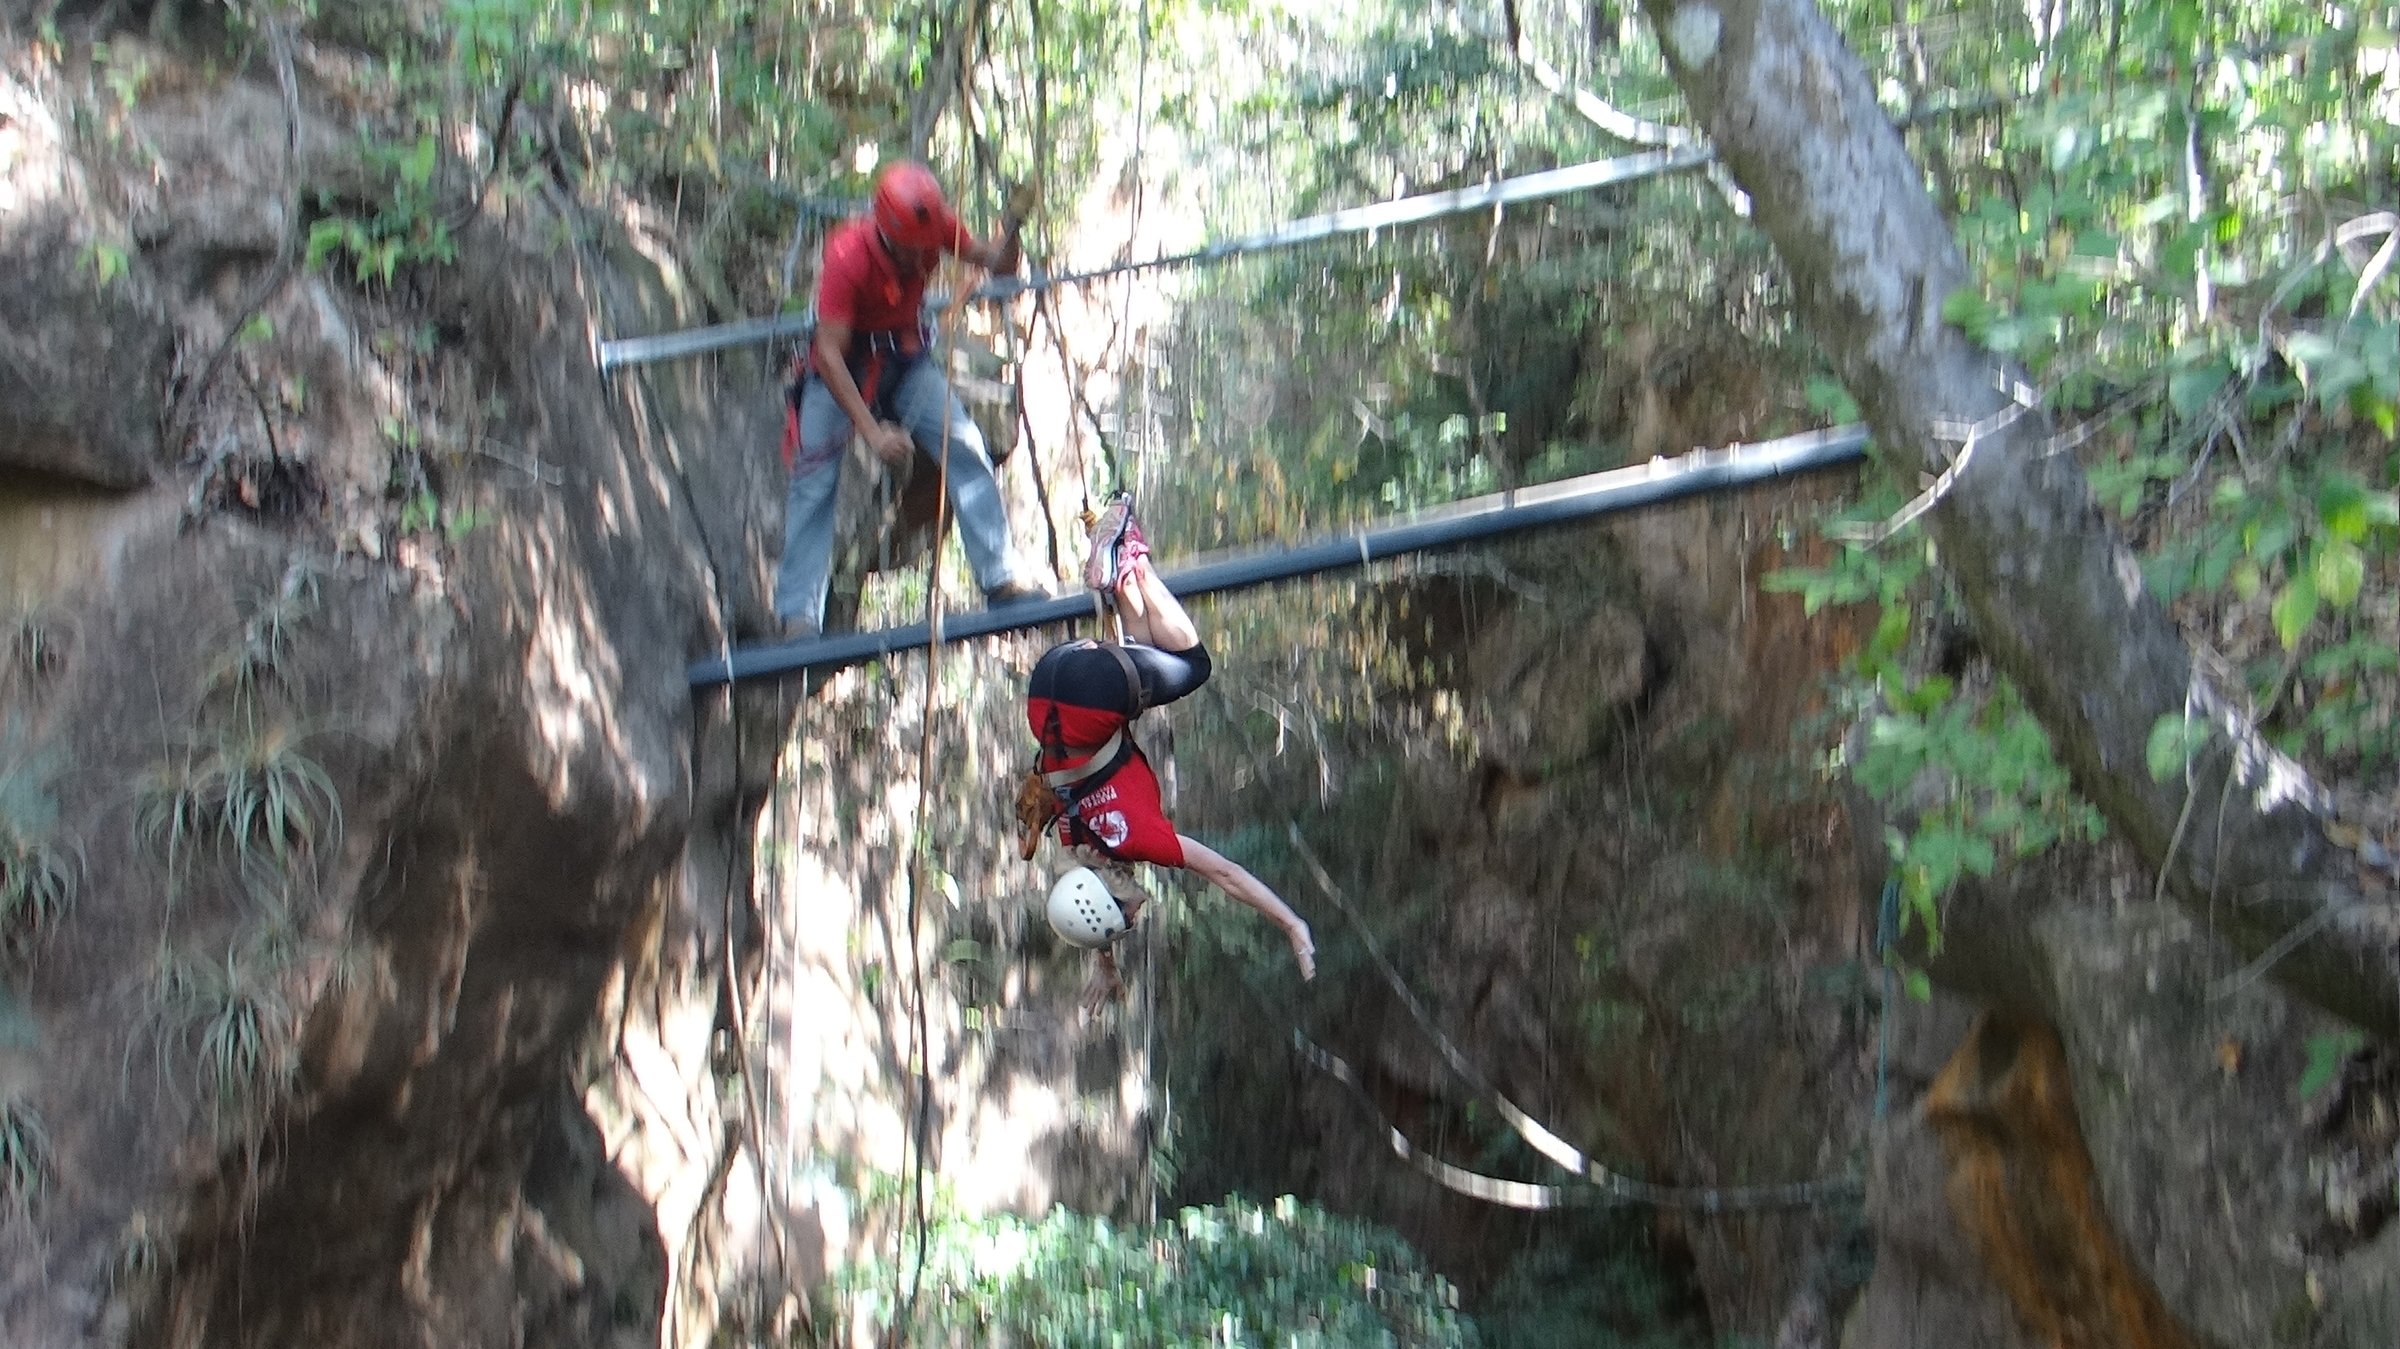 Canopy am 257